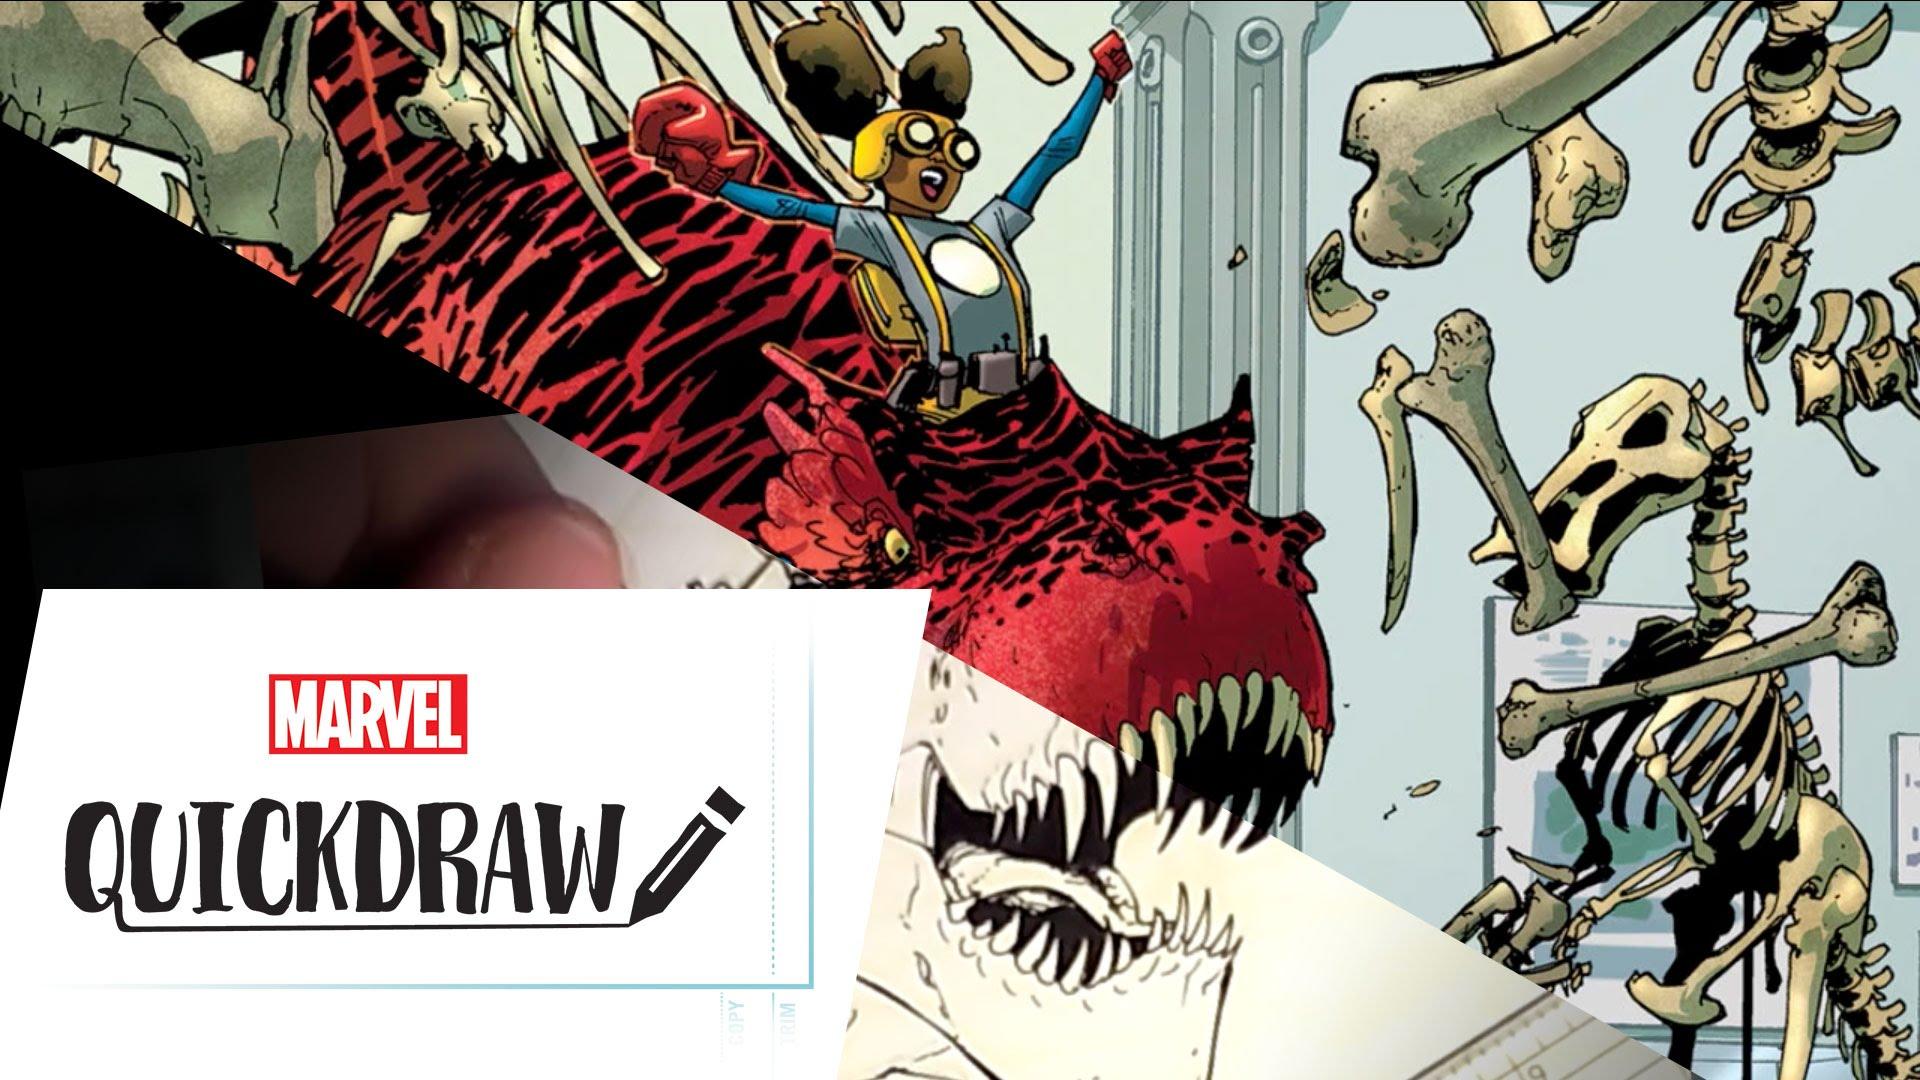 Marvel Quickdraw Season 1 3